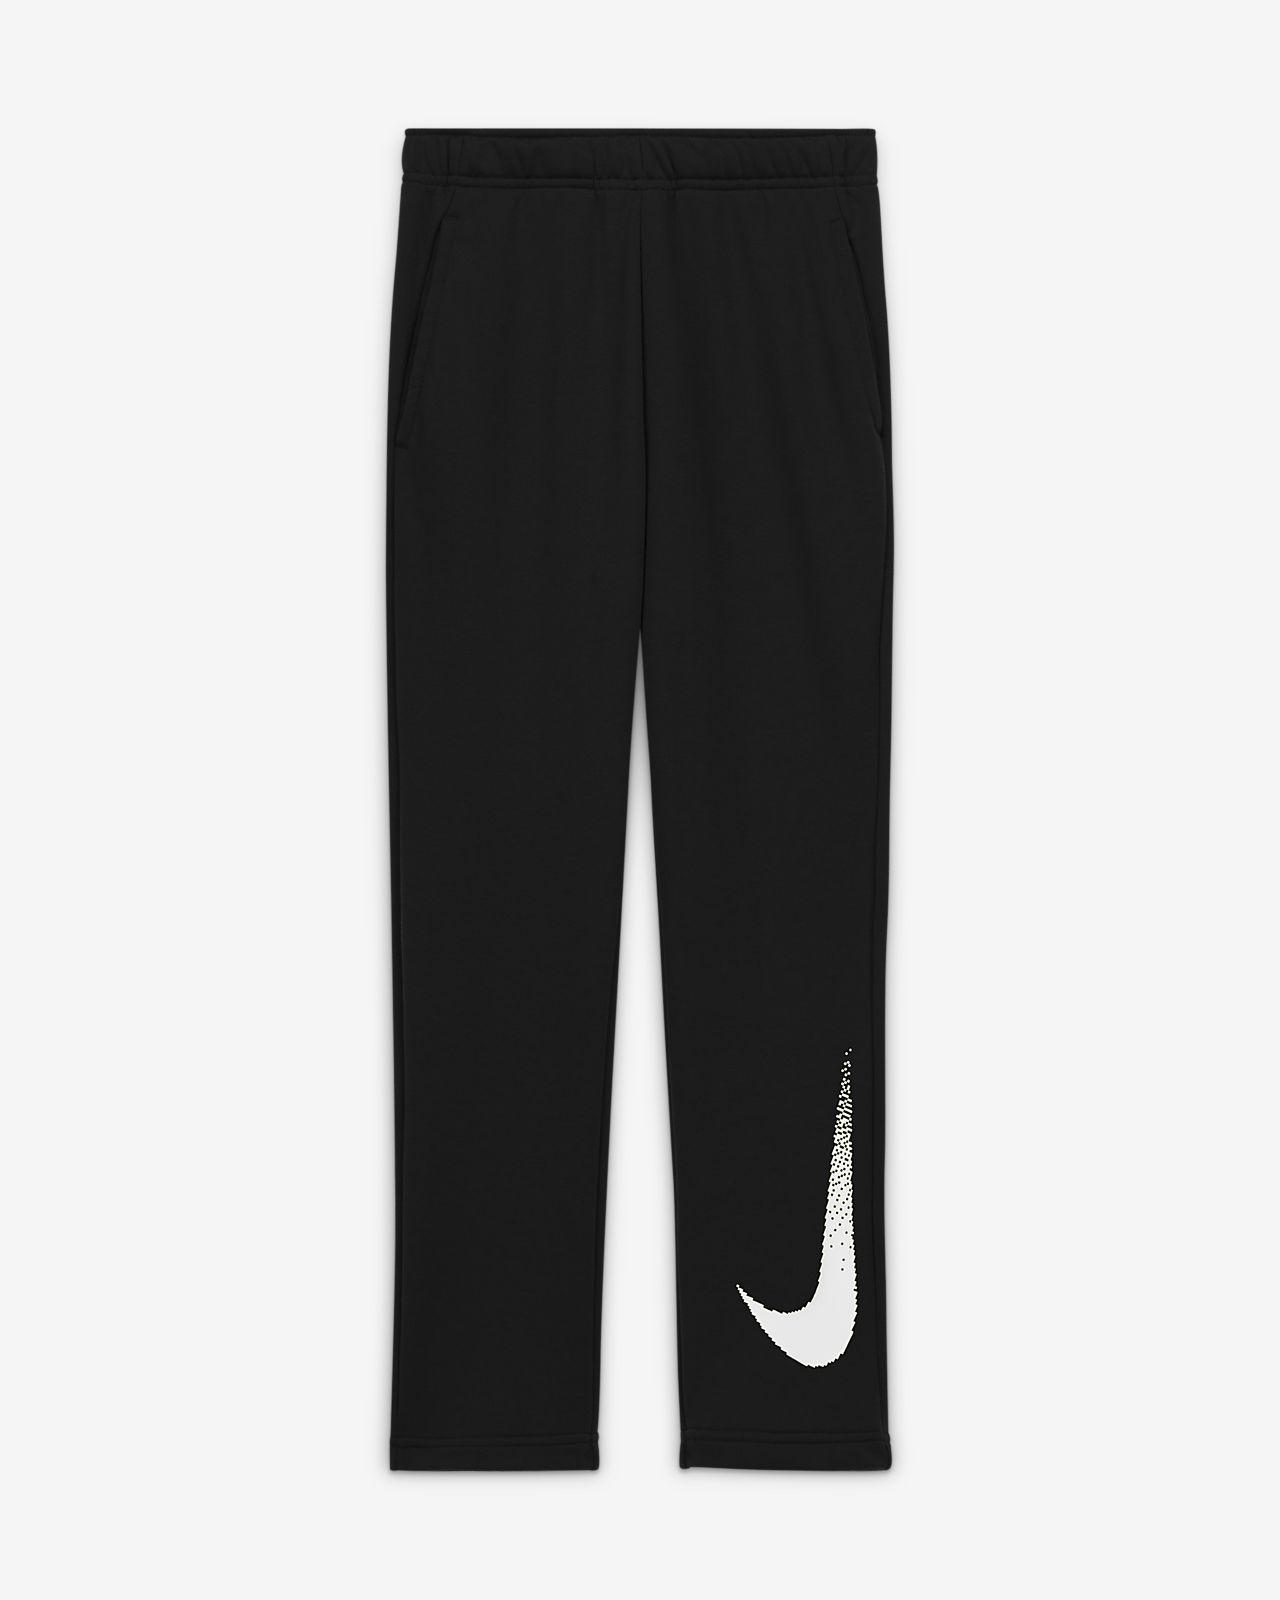 Pantalon en tissu Fleece à motif Nike Dri-FIT pour Garçon plus âgé